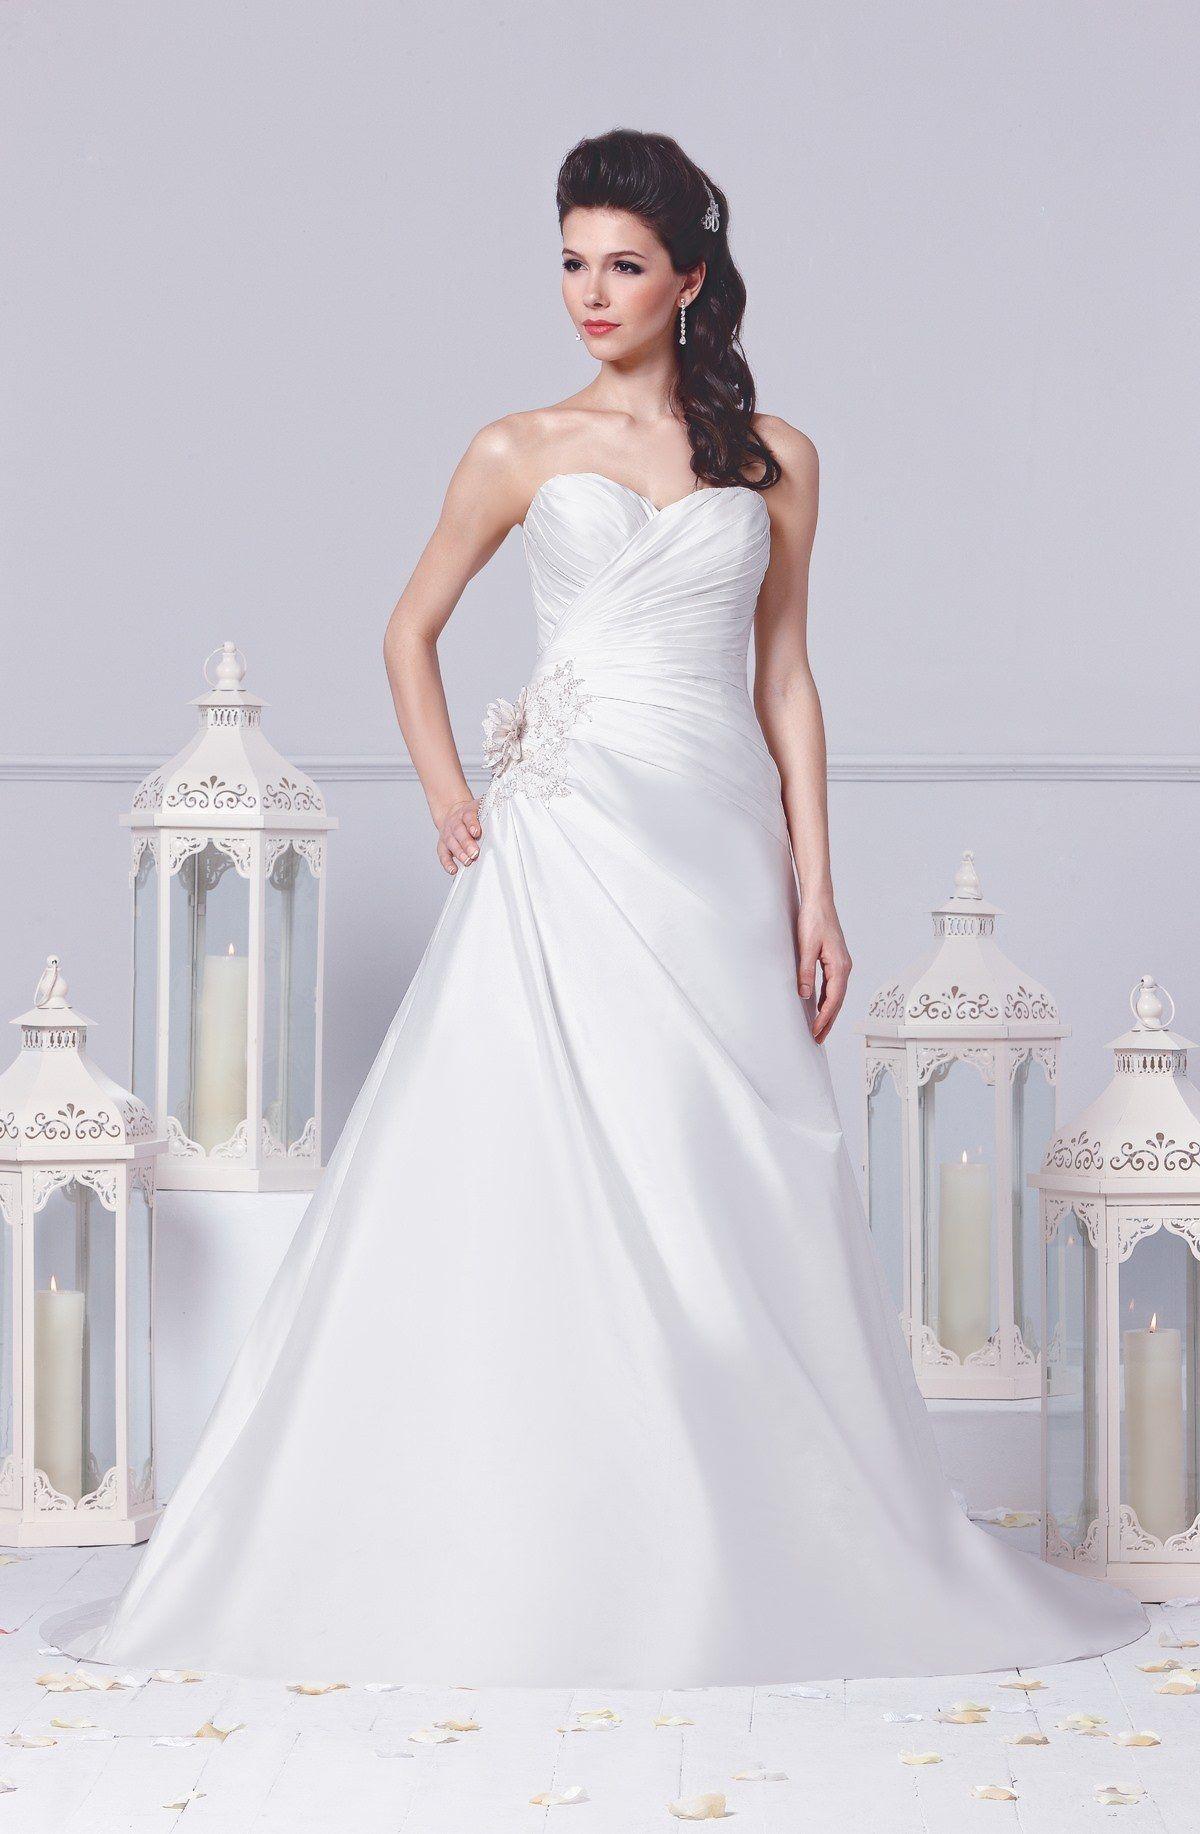 Duzage bridal wedding dresses pinterest wedding dress and wedding